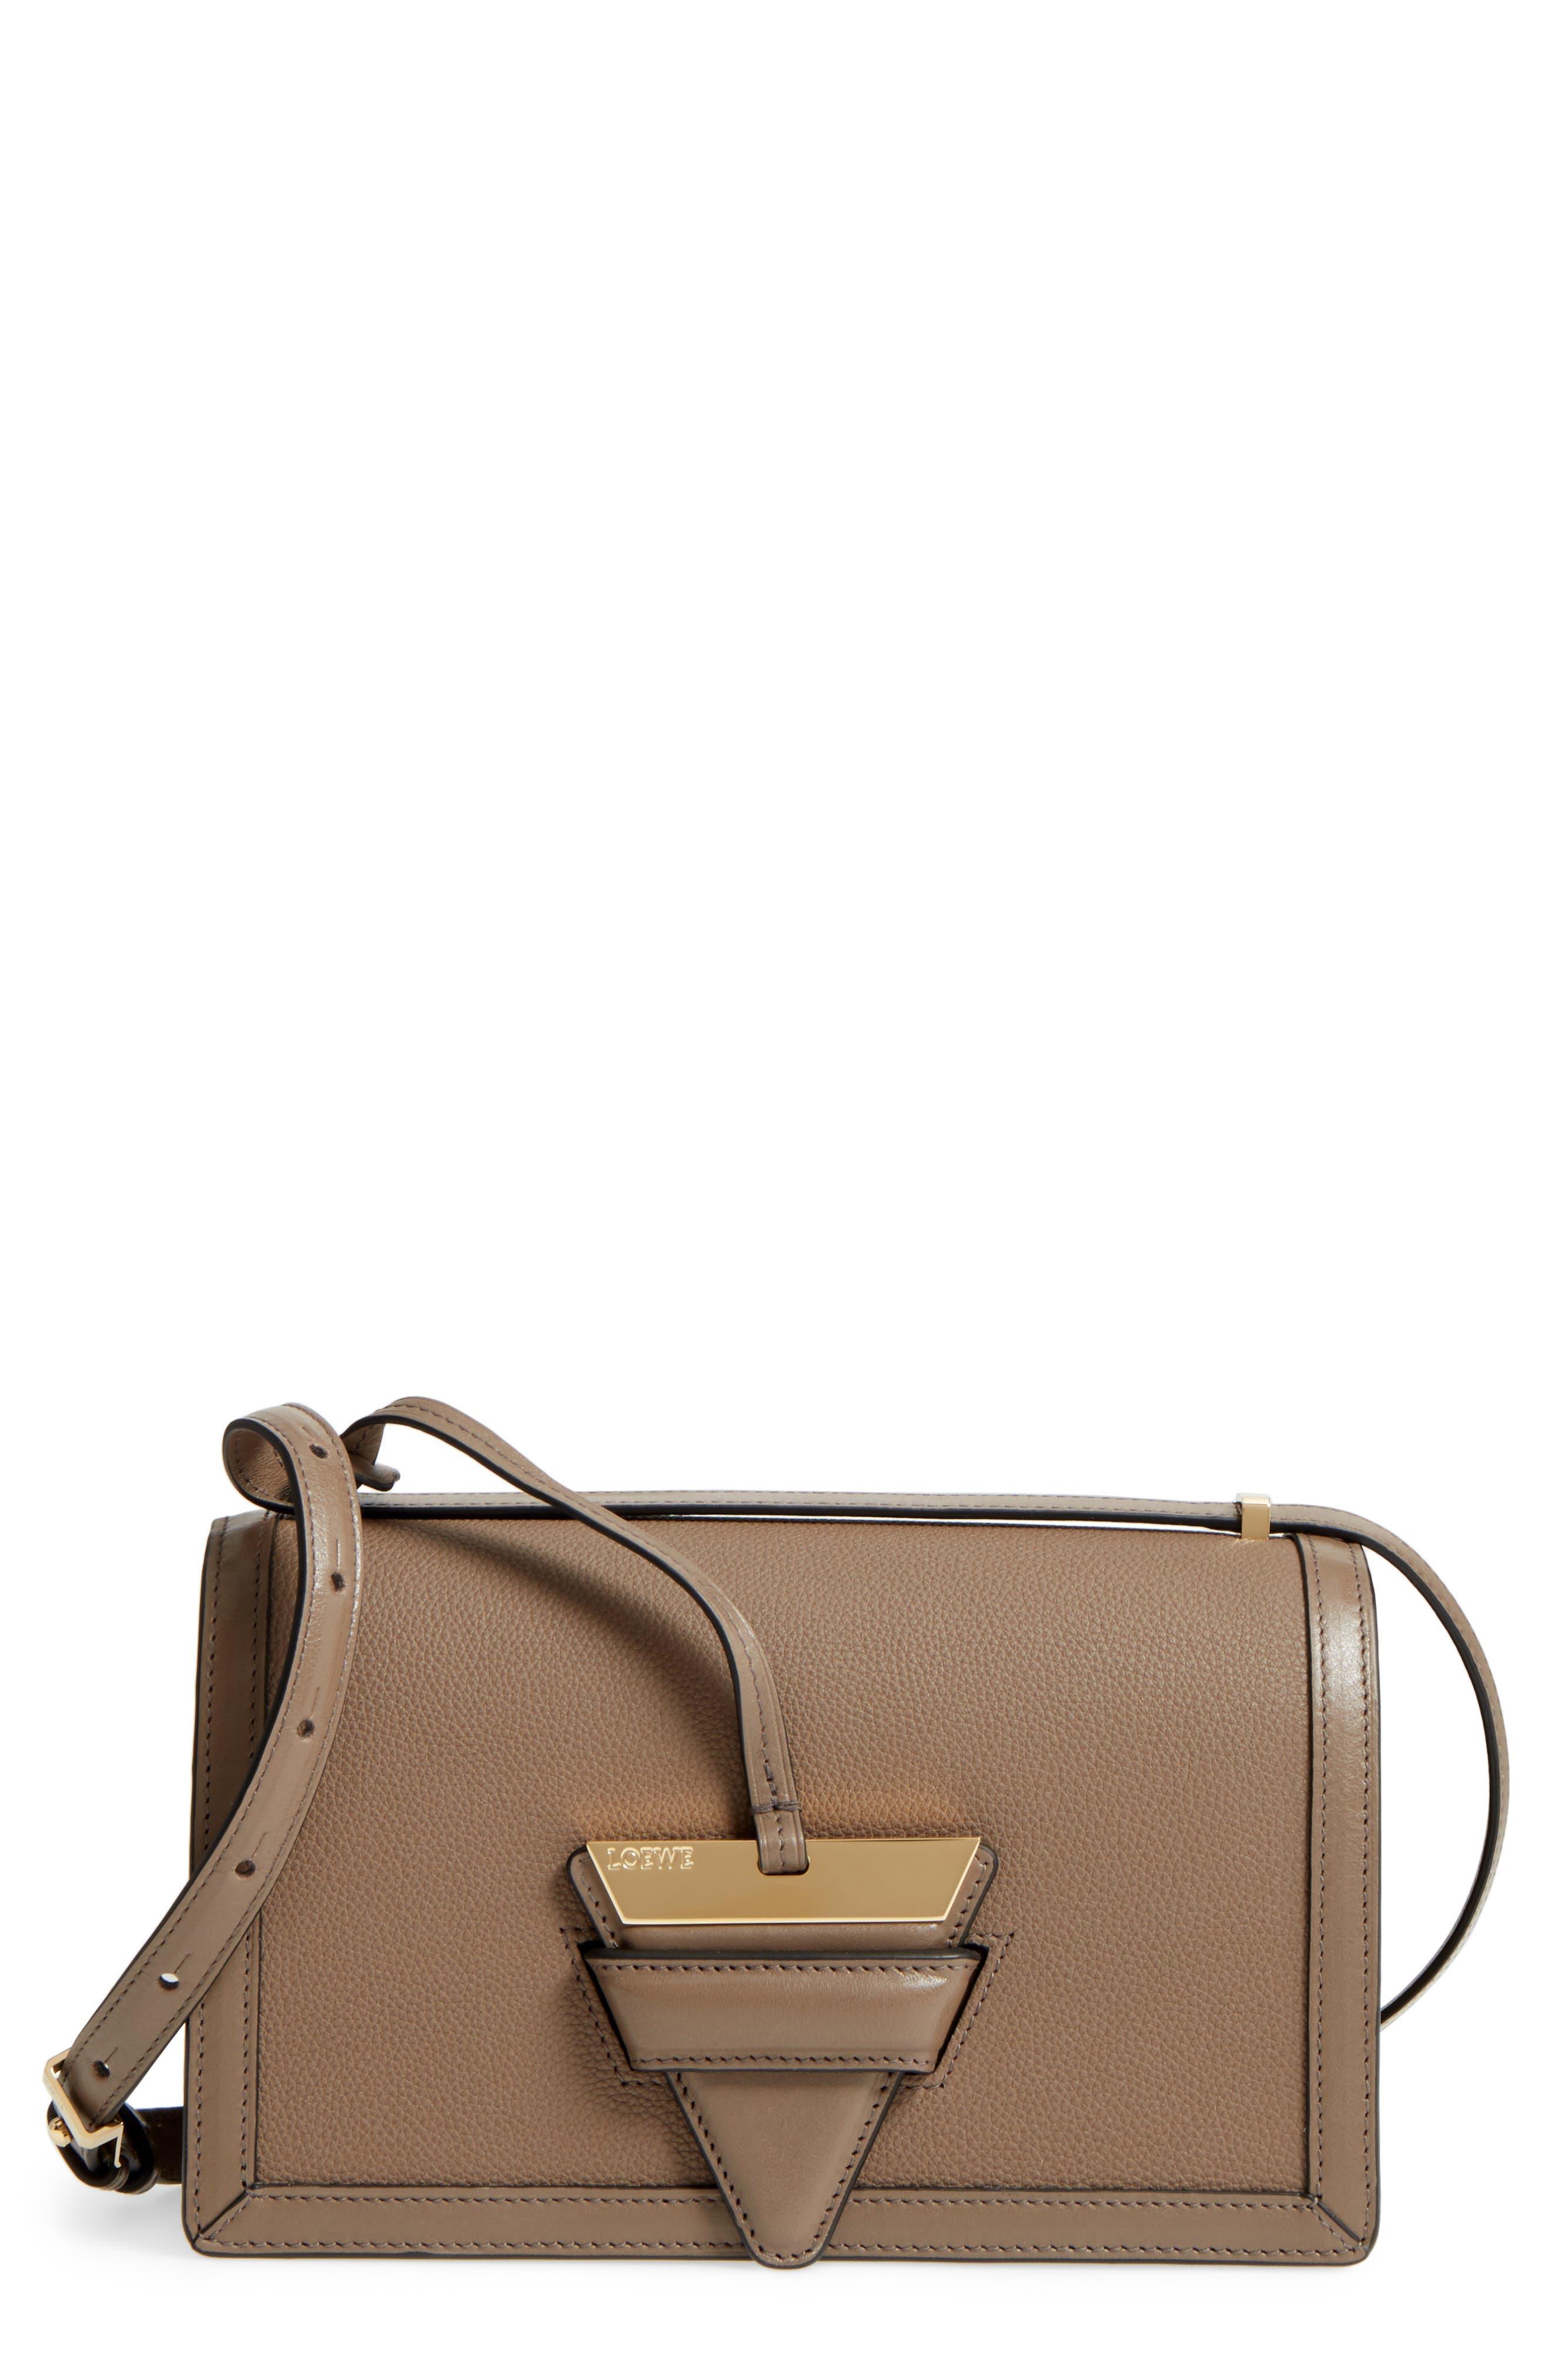 Loewe Medium Barcelona Leather Crossbody Bag